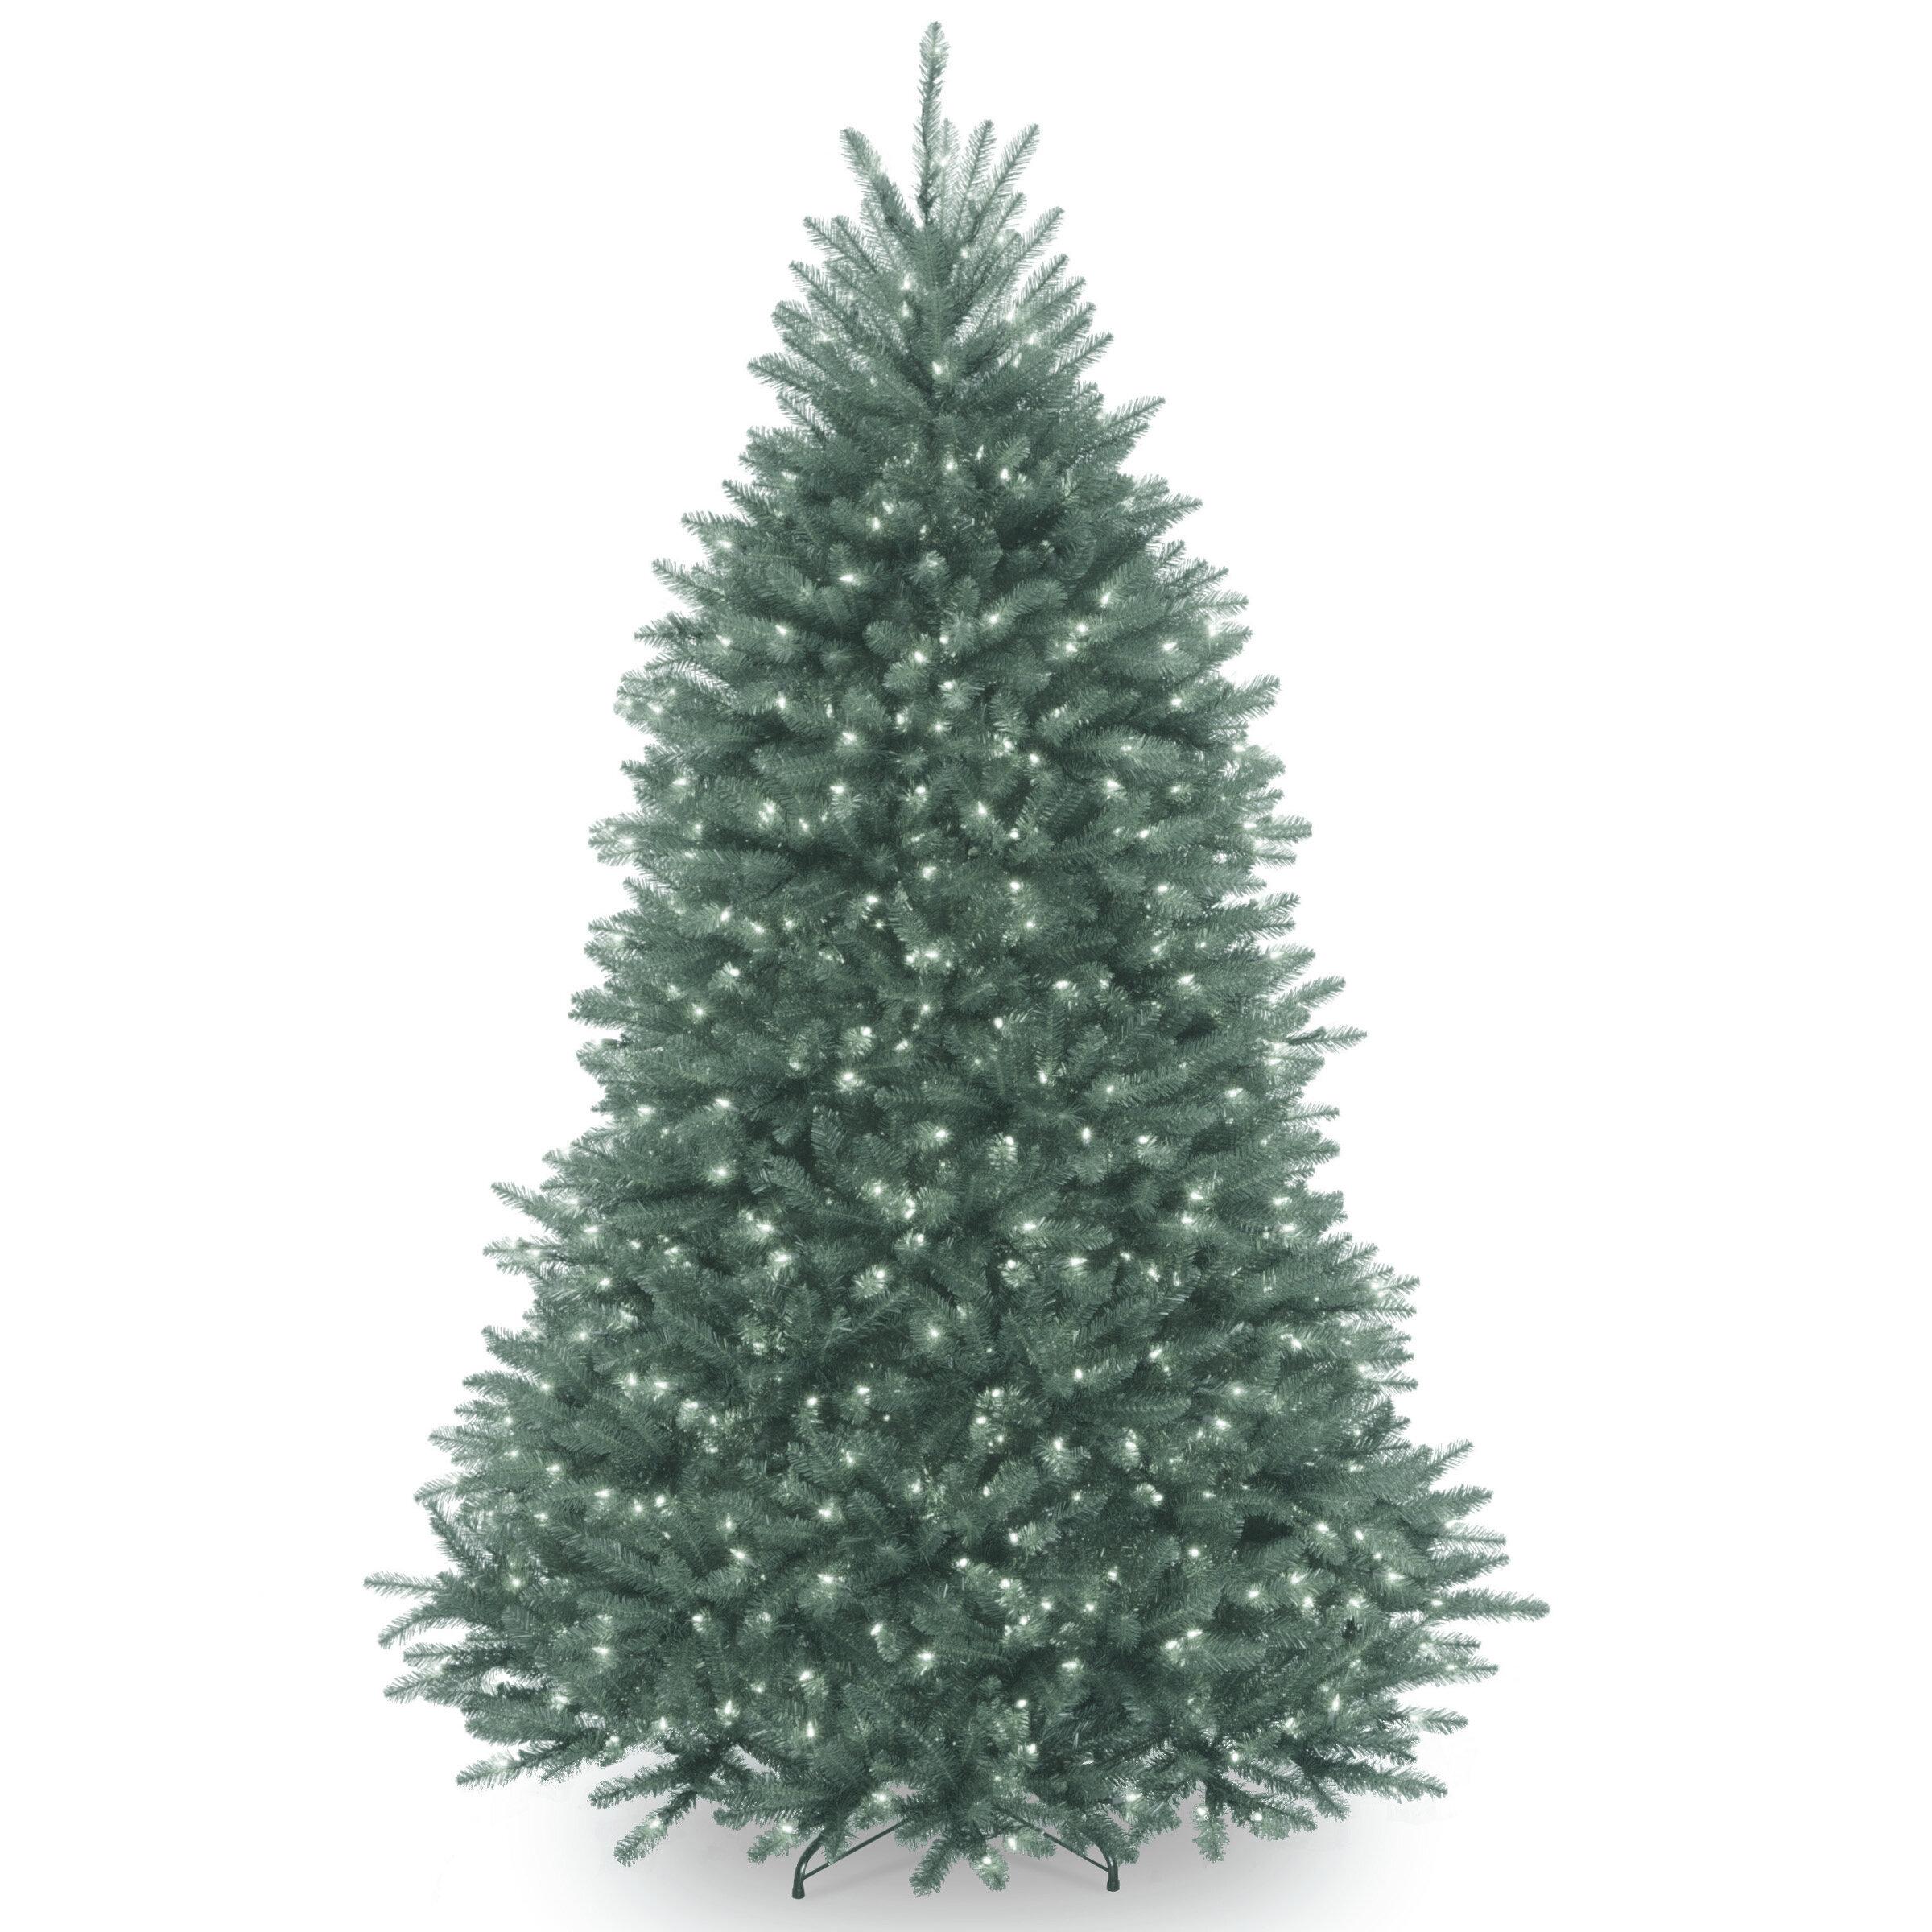 Artificial Christmas Tree Branches.Green Fir Artificial Christmas Tree With Clear Lights With Stand